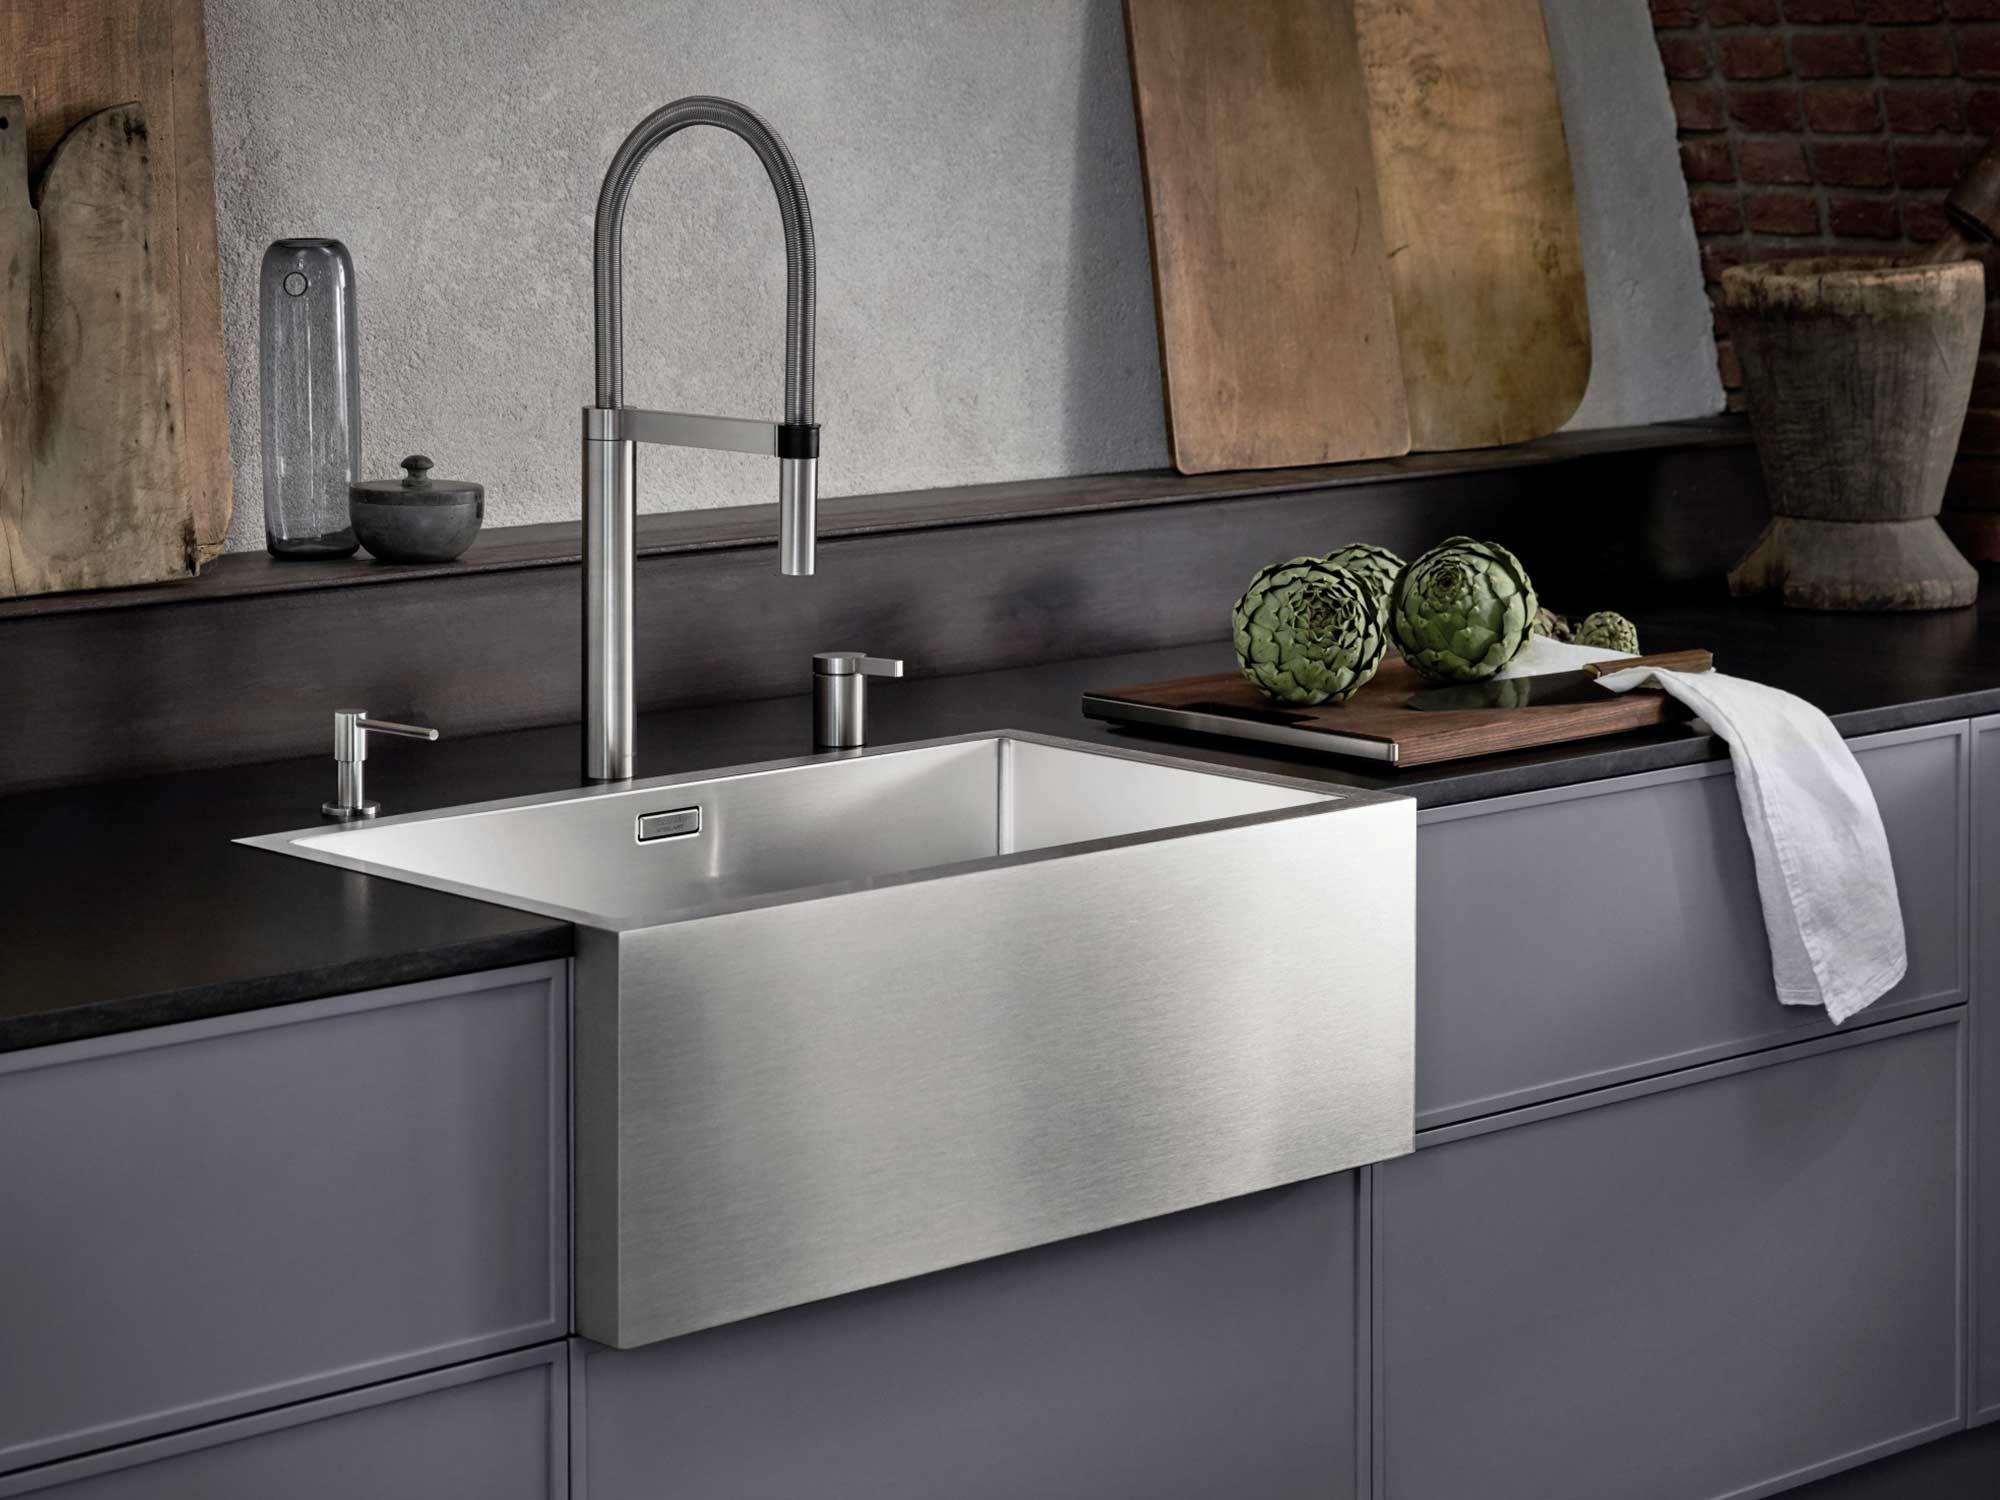 Blanco kitchen sink in stainless steel